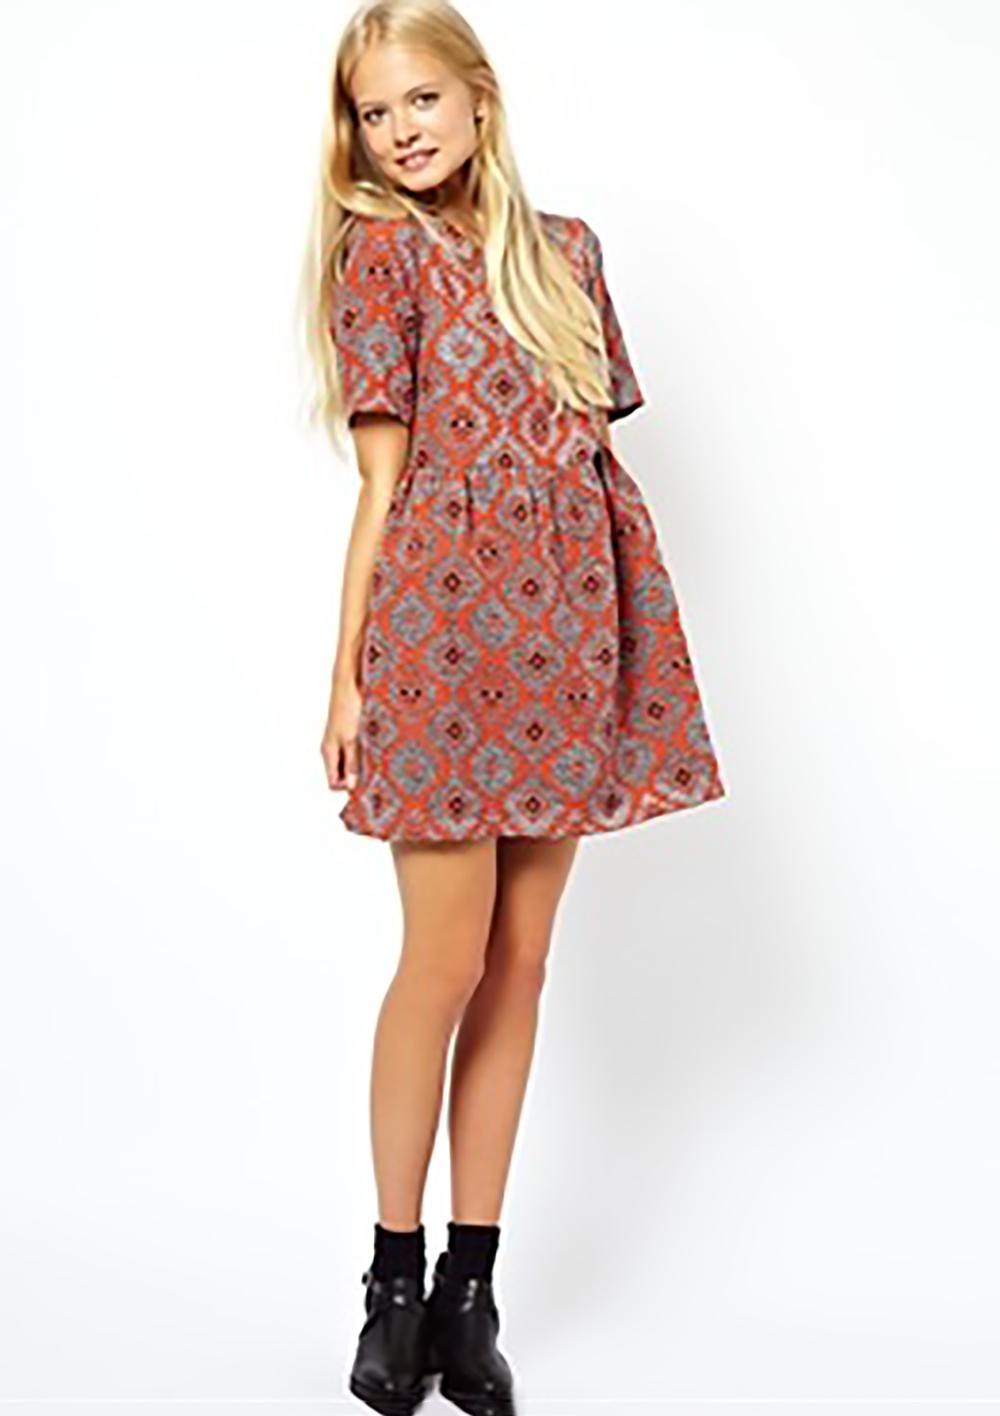 asos smock dress in geo-tribal jacquard short dresses 1500.jpg